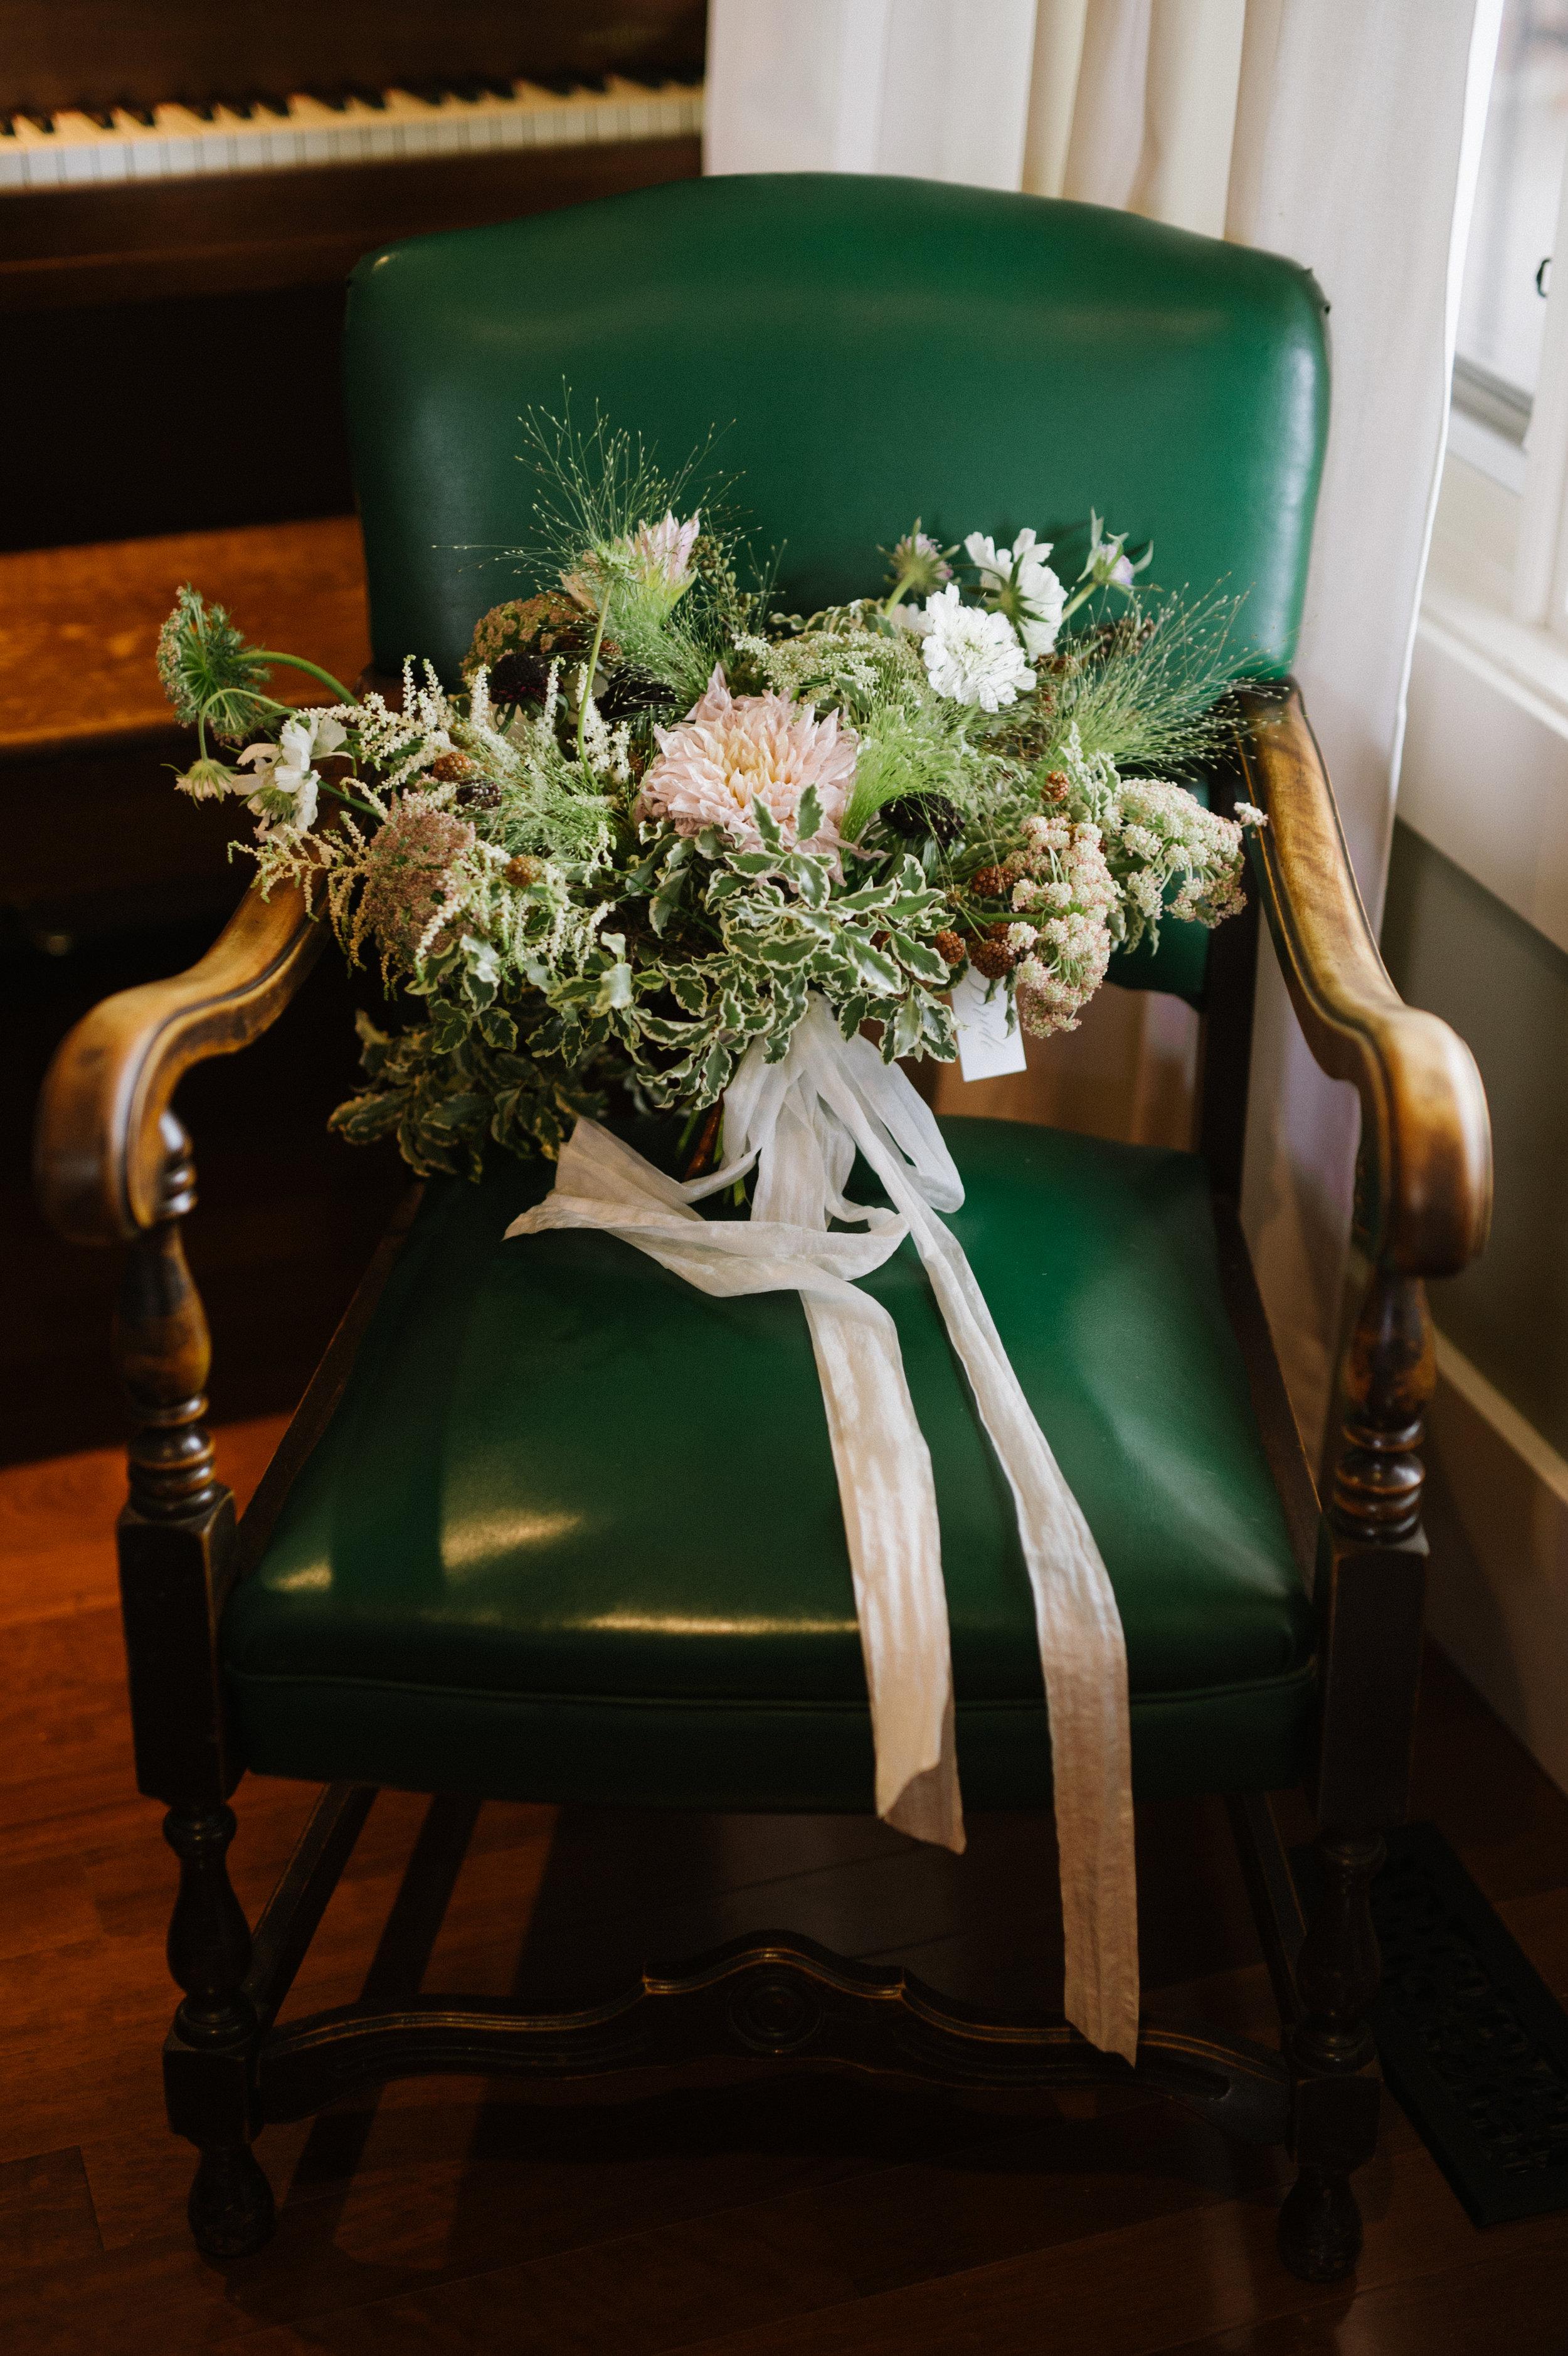 Teatro_Wedding_Calgary_Wedding_Photography_Vanessa_Tom_Married_2018_HR003.jpg